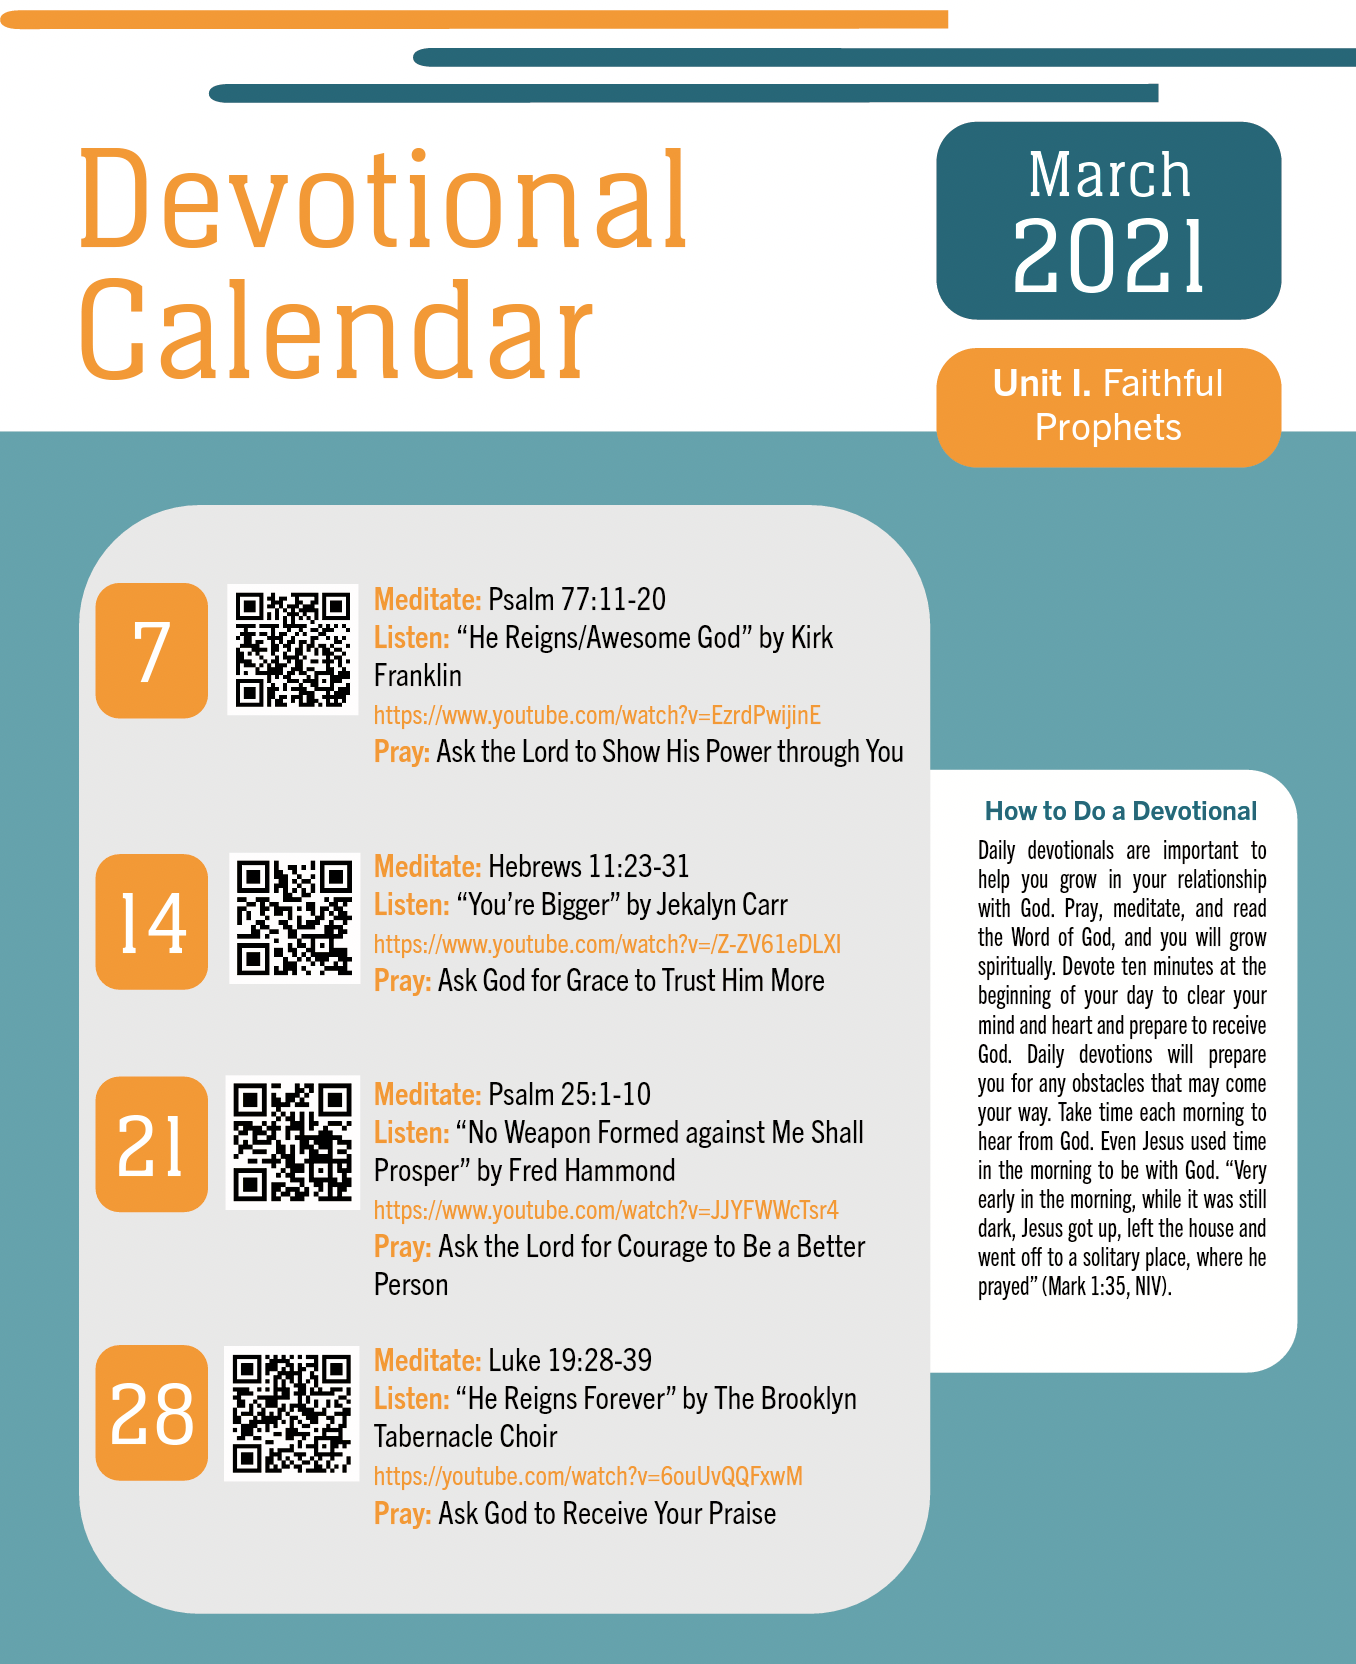 March 2021 Devotional